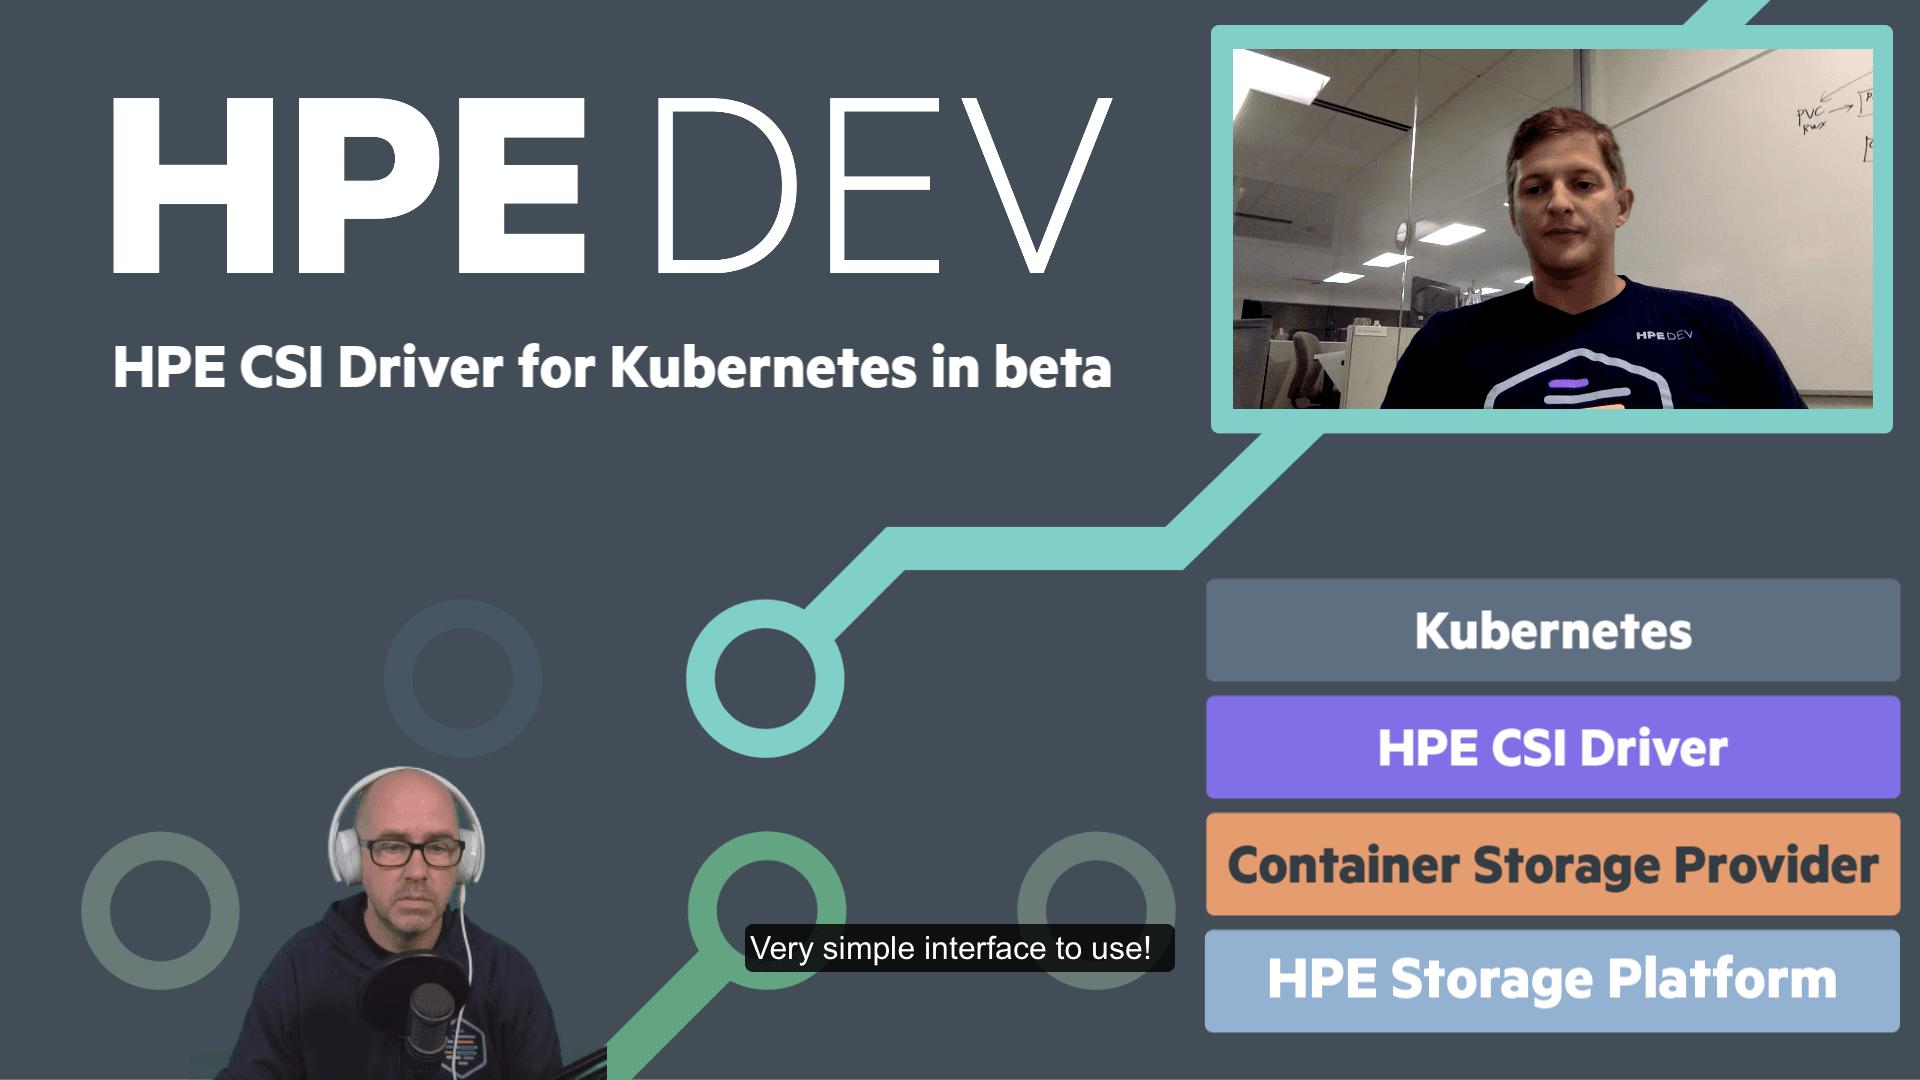 Introducing the multi-platform and multi-vendor HPE CSI Driver (beta) for Kubernetes